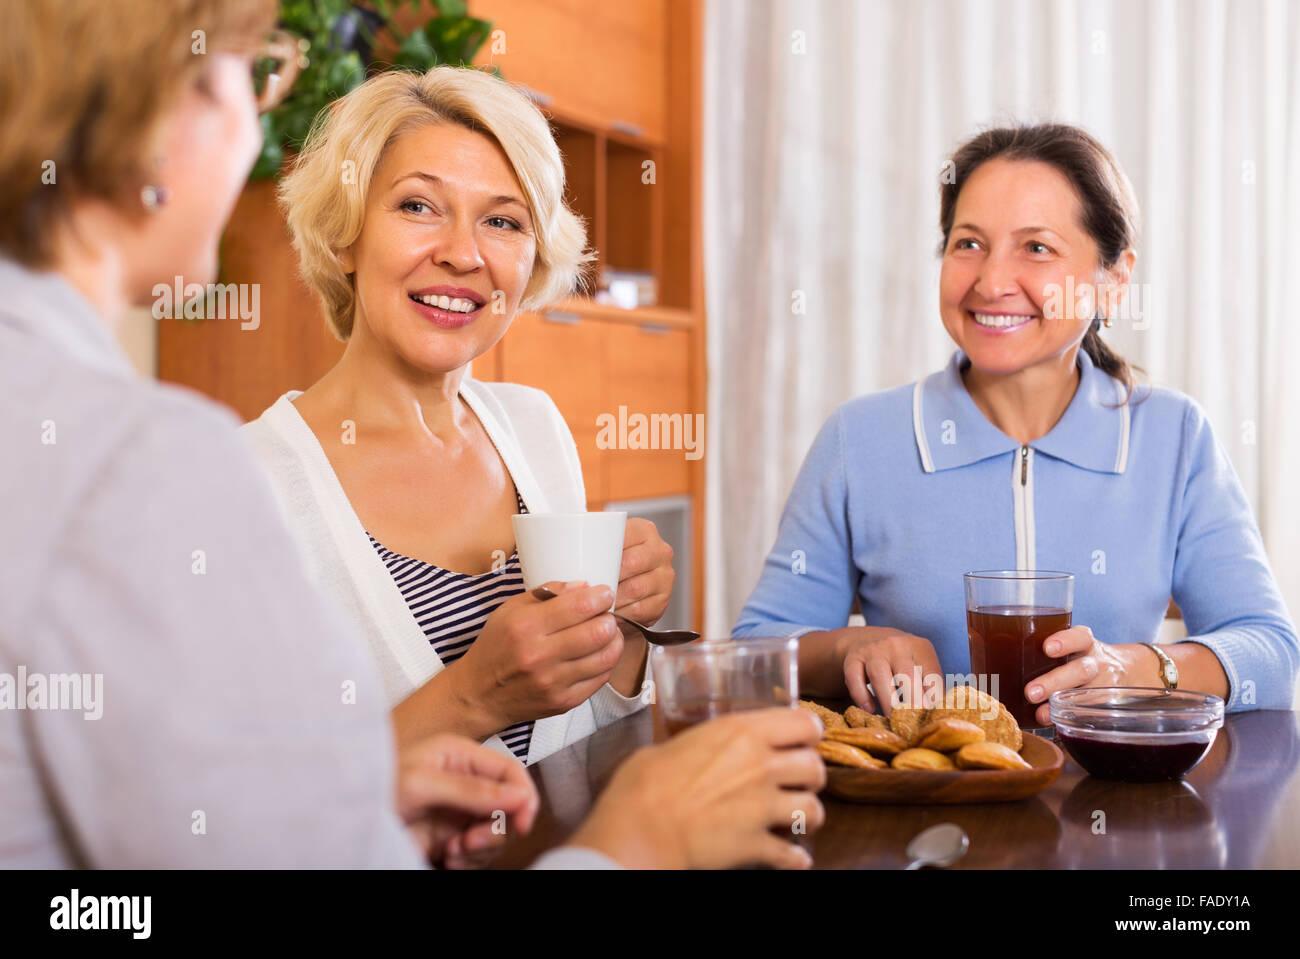 Happy mature women having coffee break at office. Focus on blonde woman